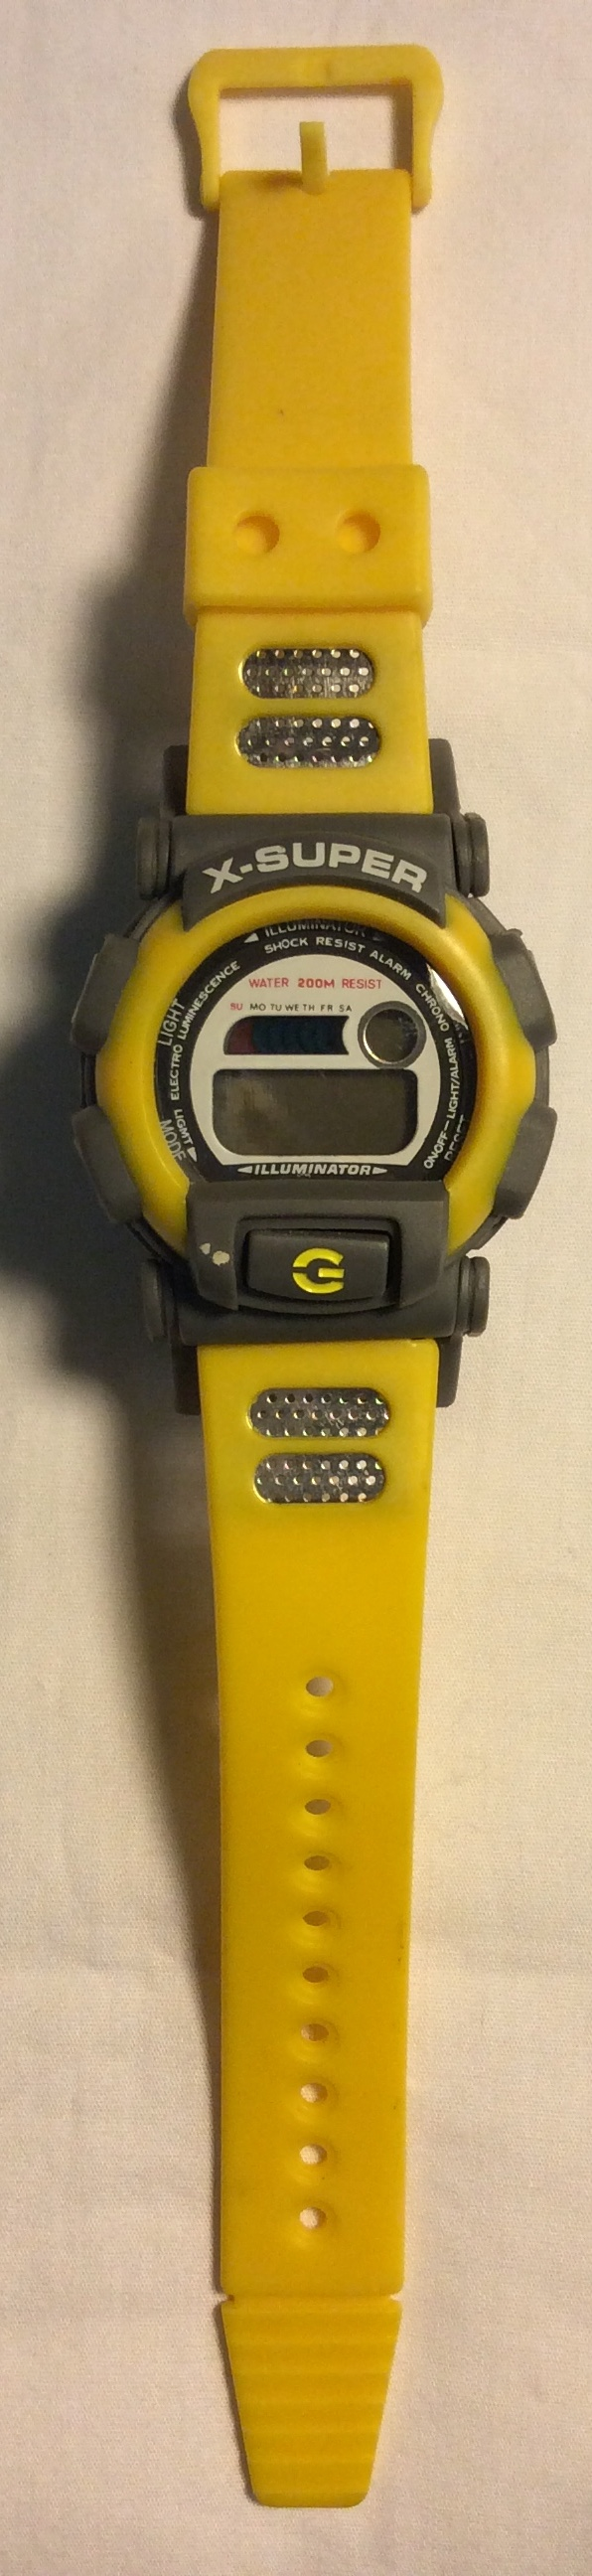 X-Super watch  - digital face